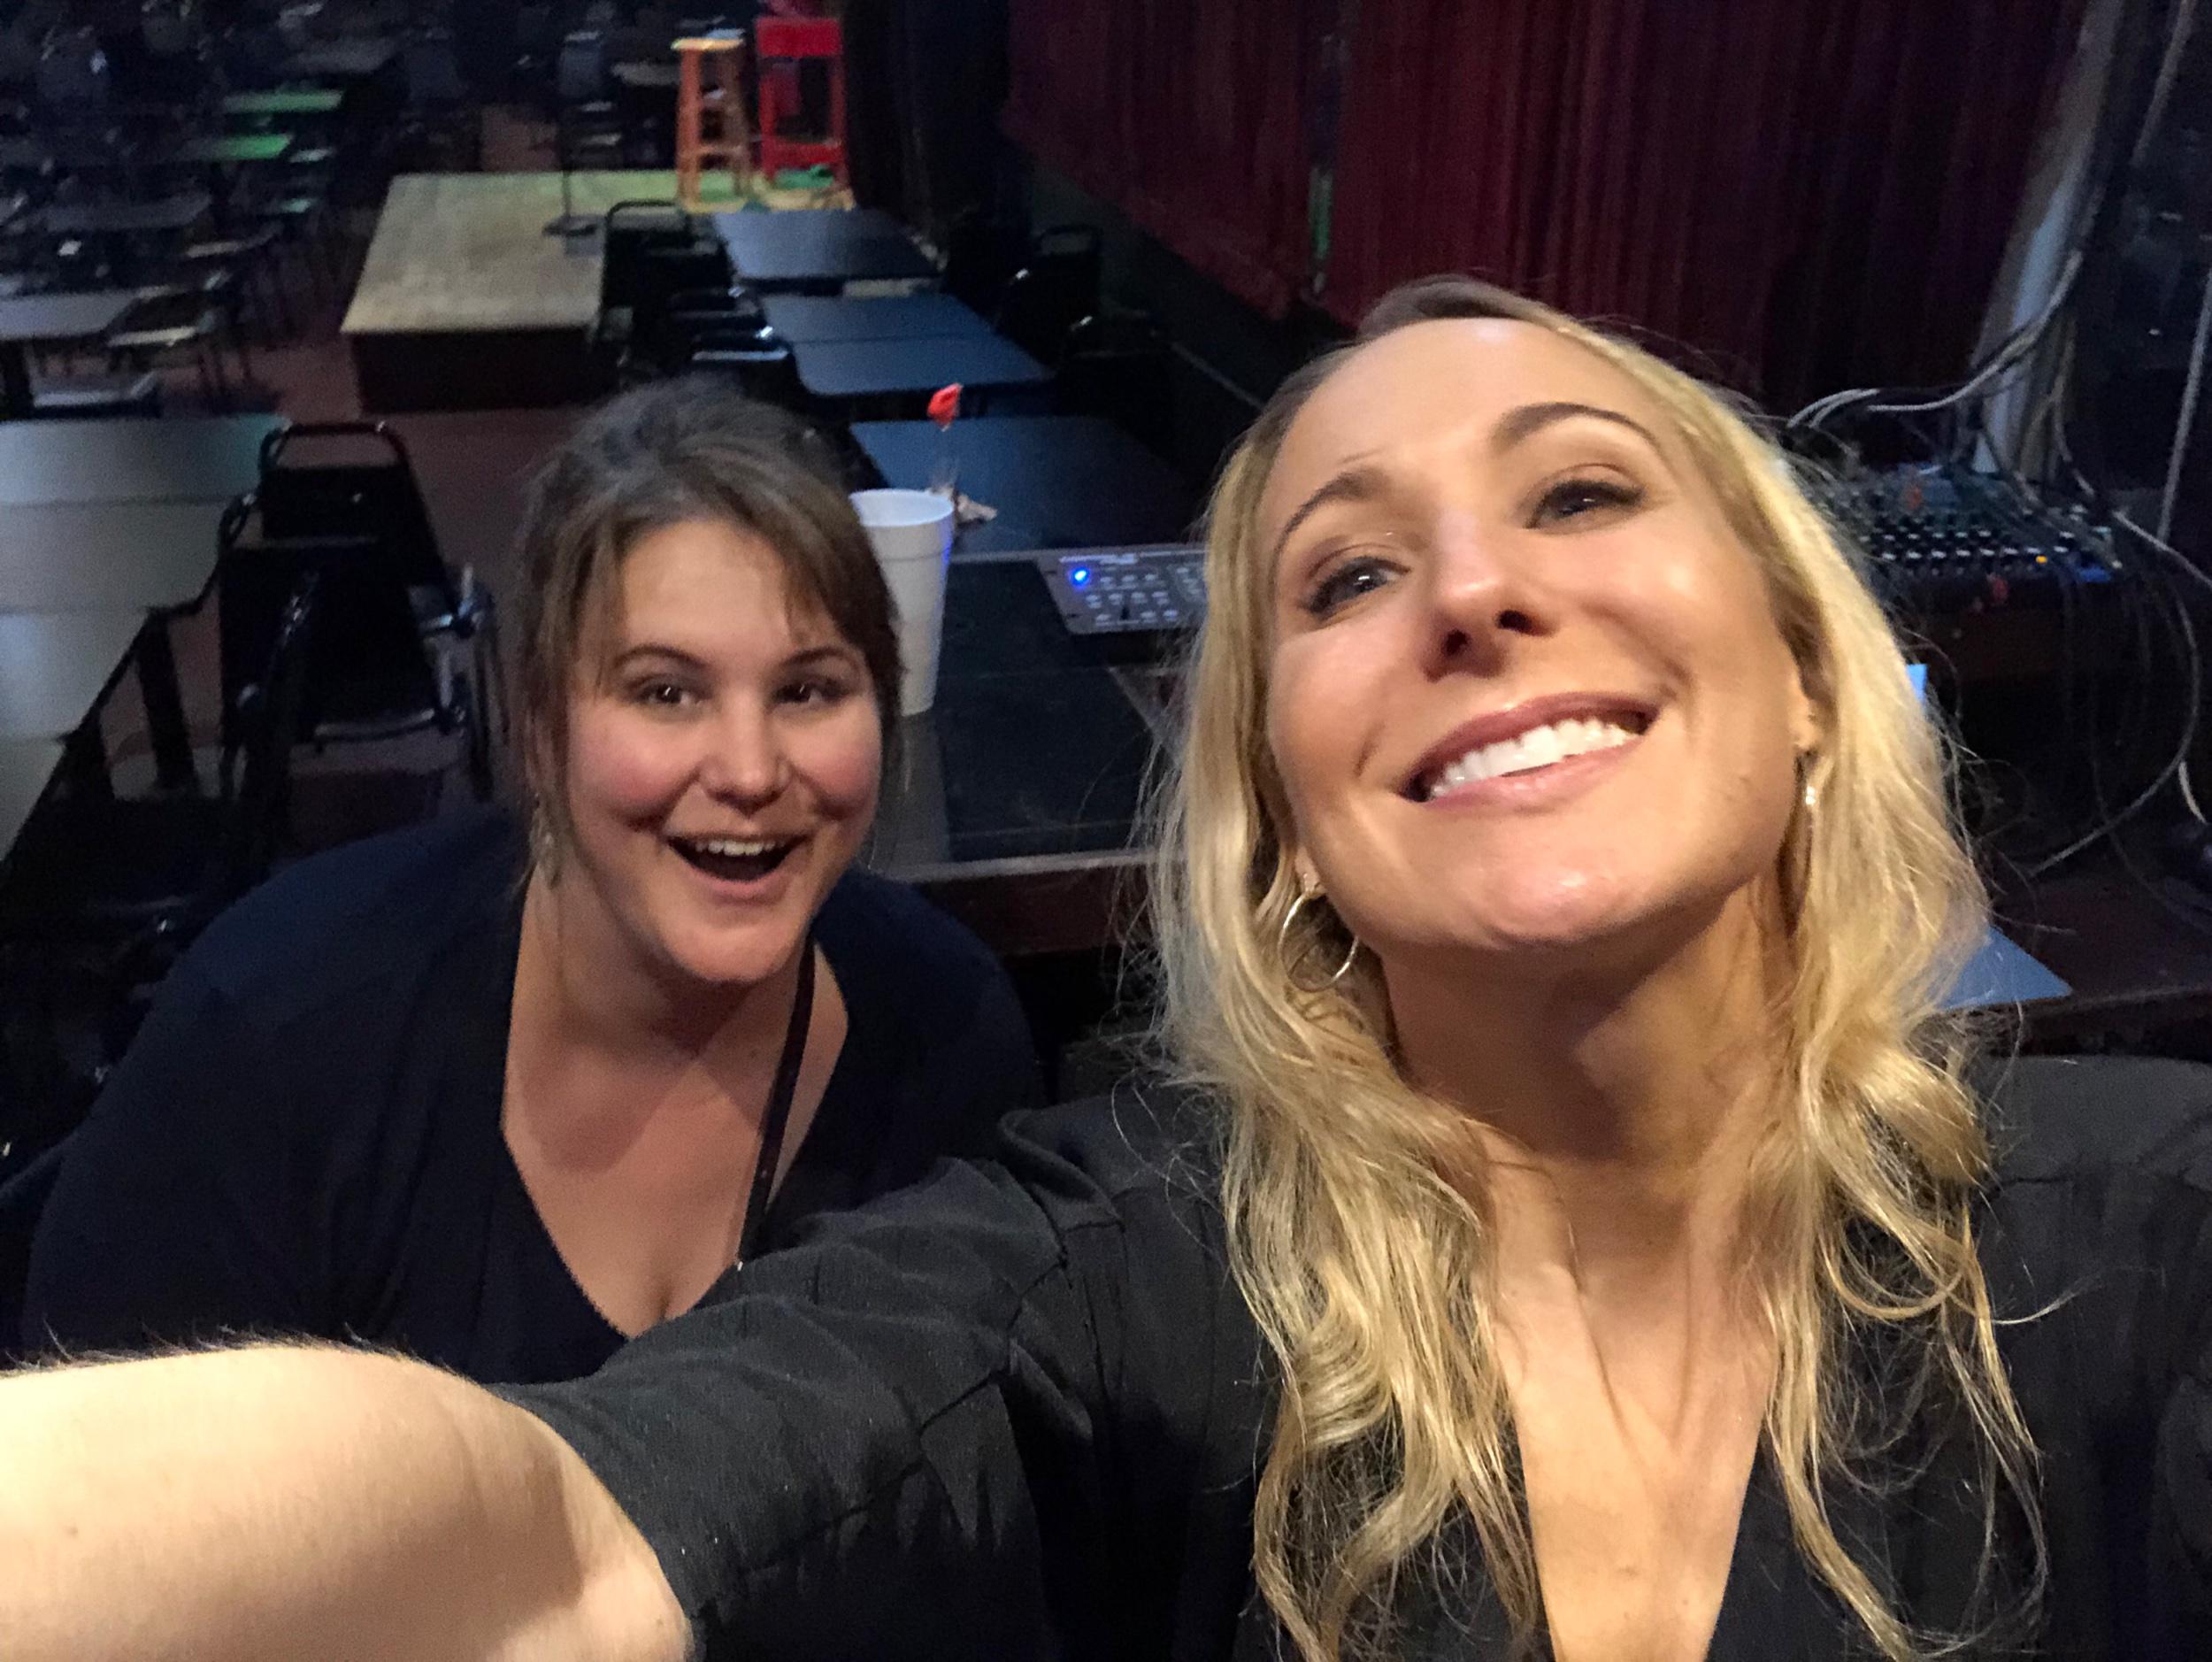 Nikki Glaser recreating my Andrew selfie after her show in ATL